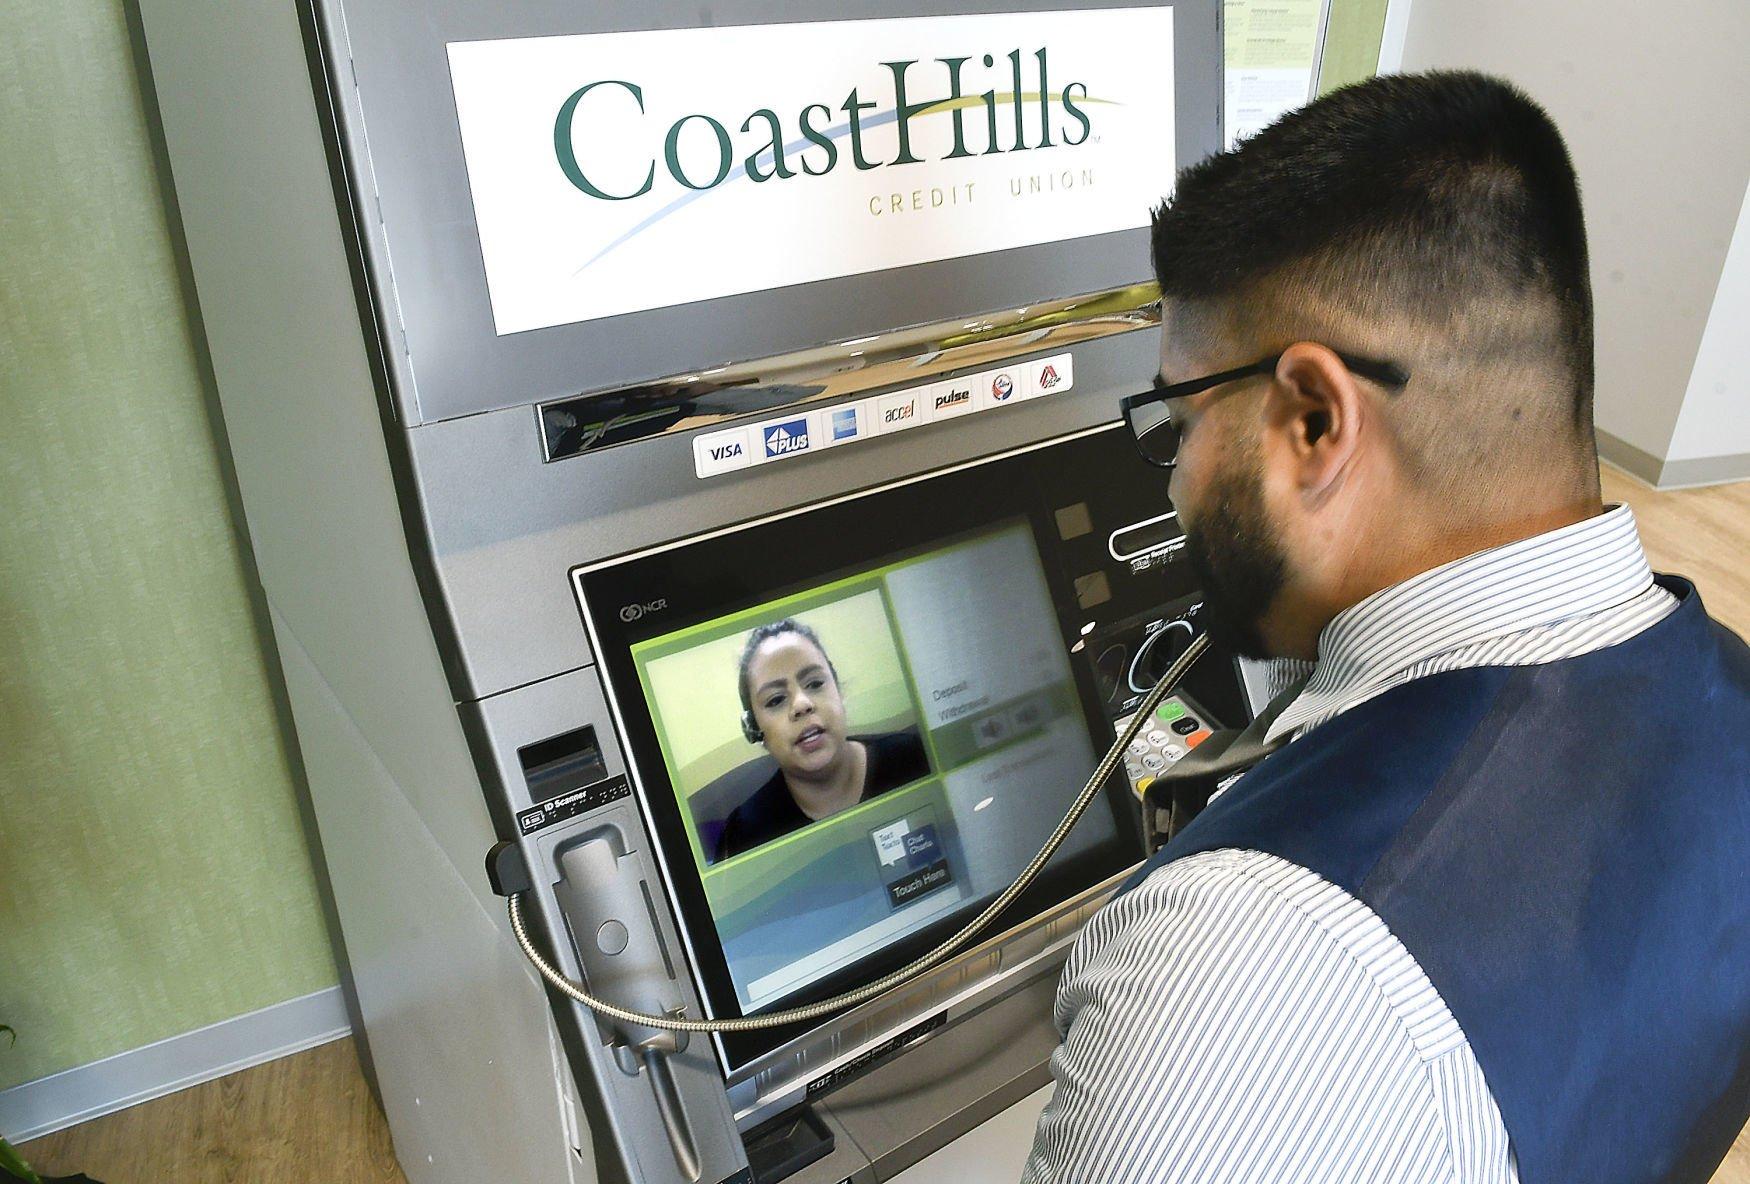 Микрозаймы на карту за 5 минут без проверки кредитной истории срочно без отказа